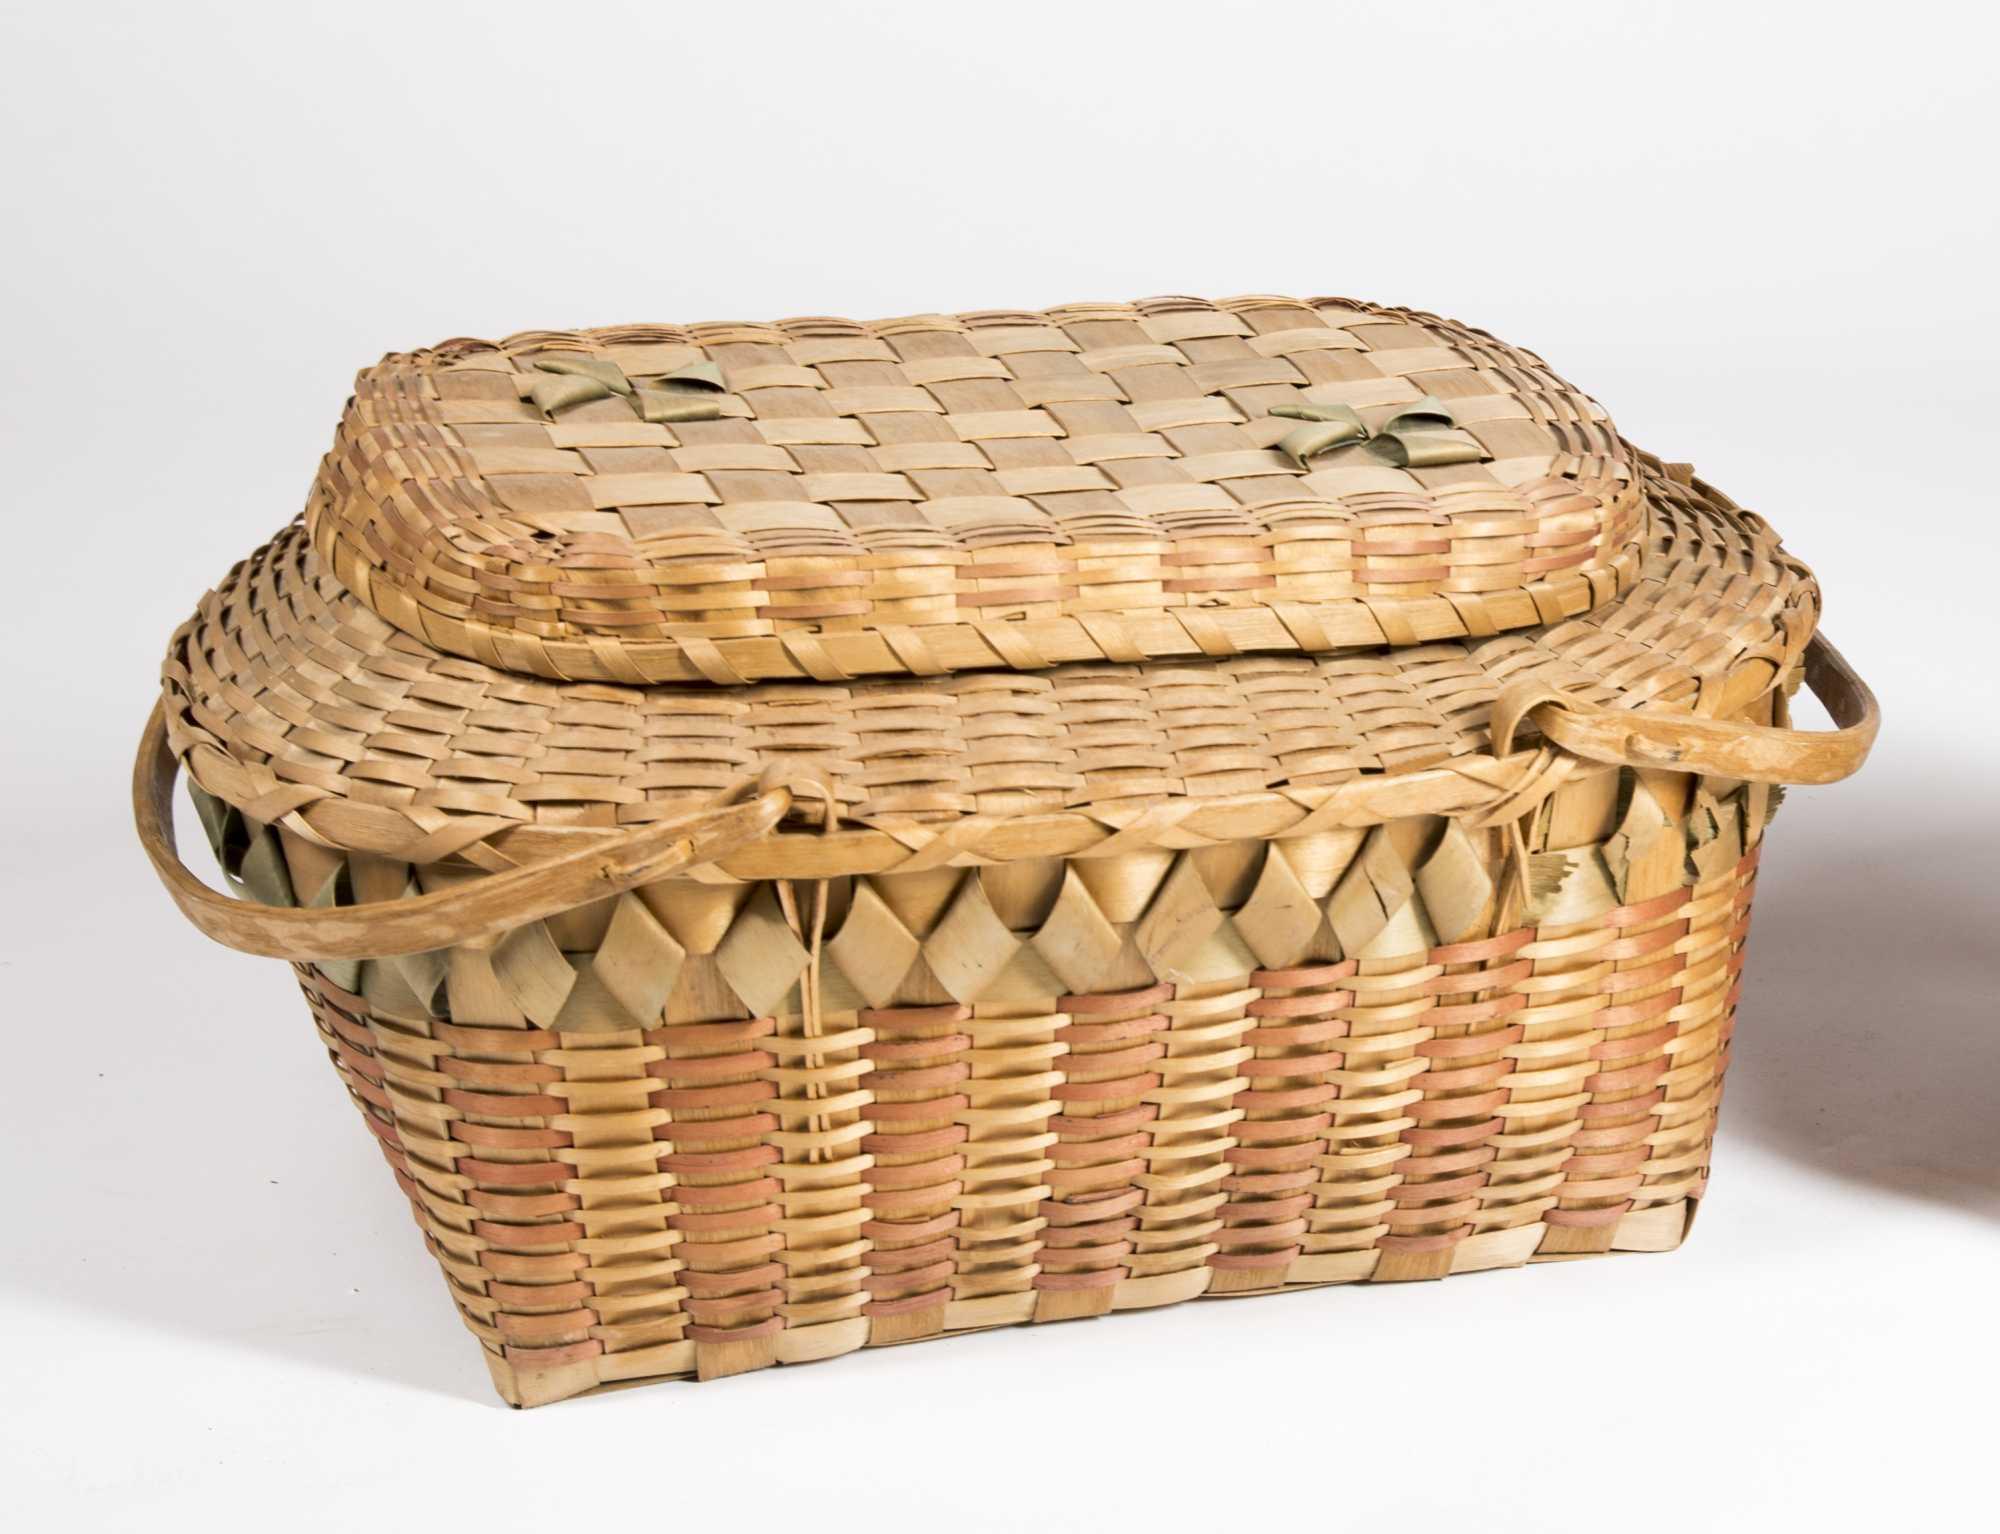 Two Native American Quot Micmac Quot Splint Baskets